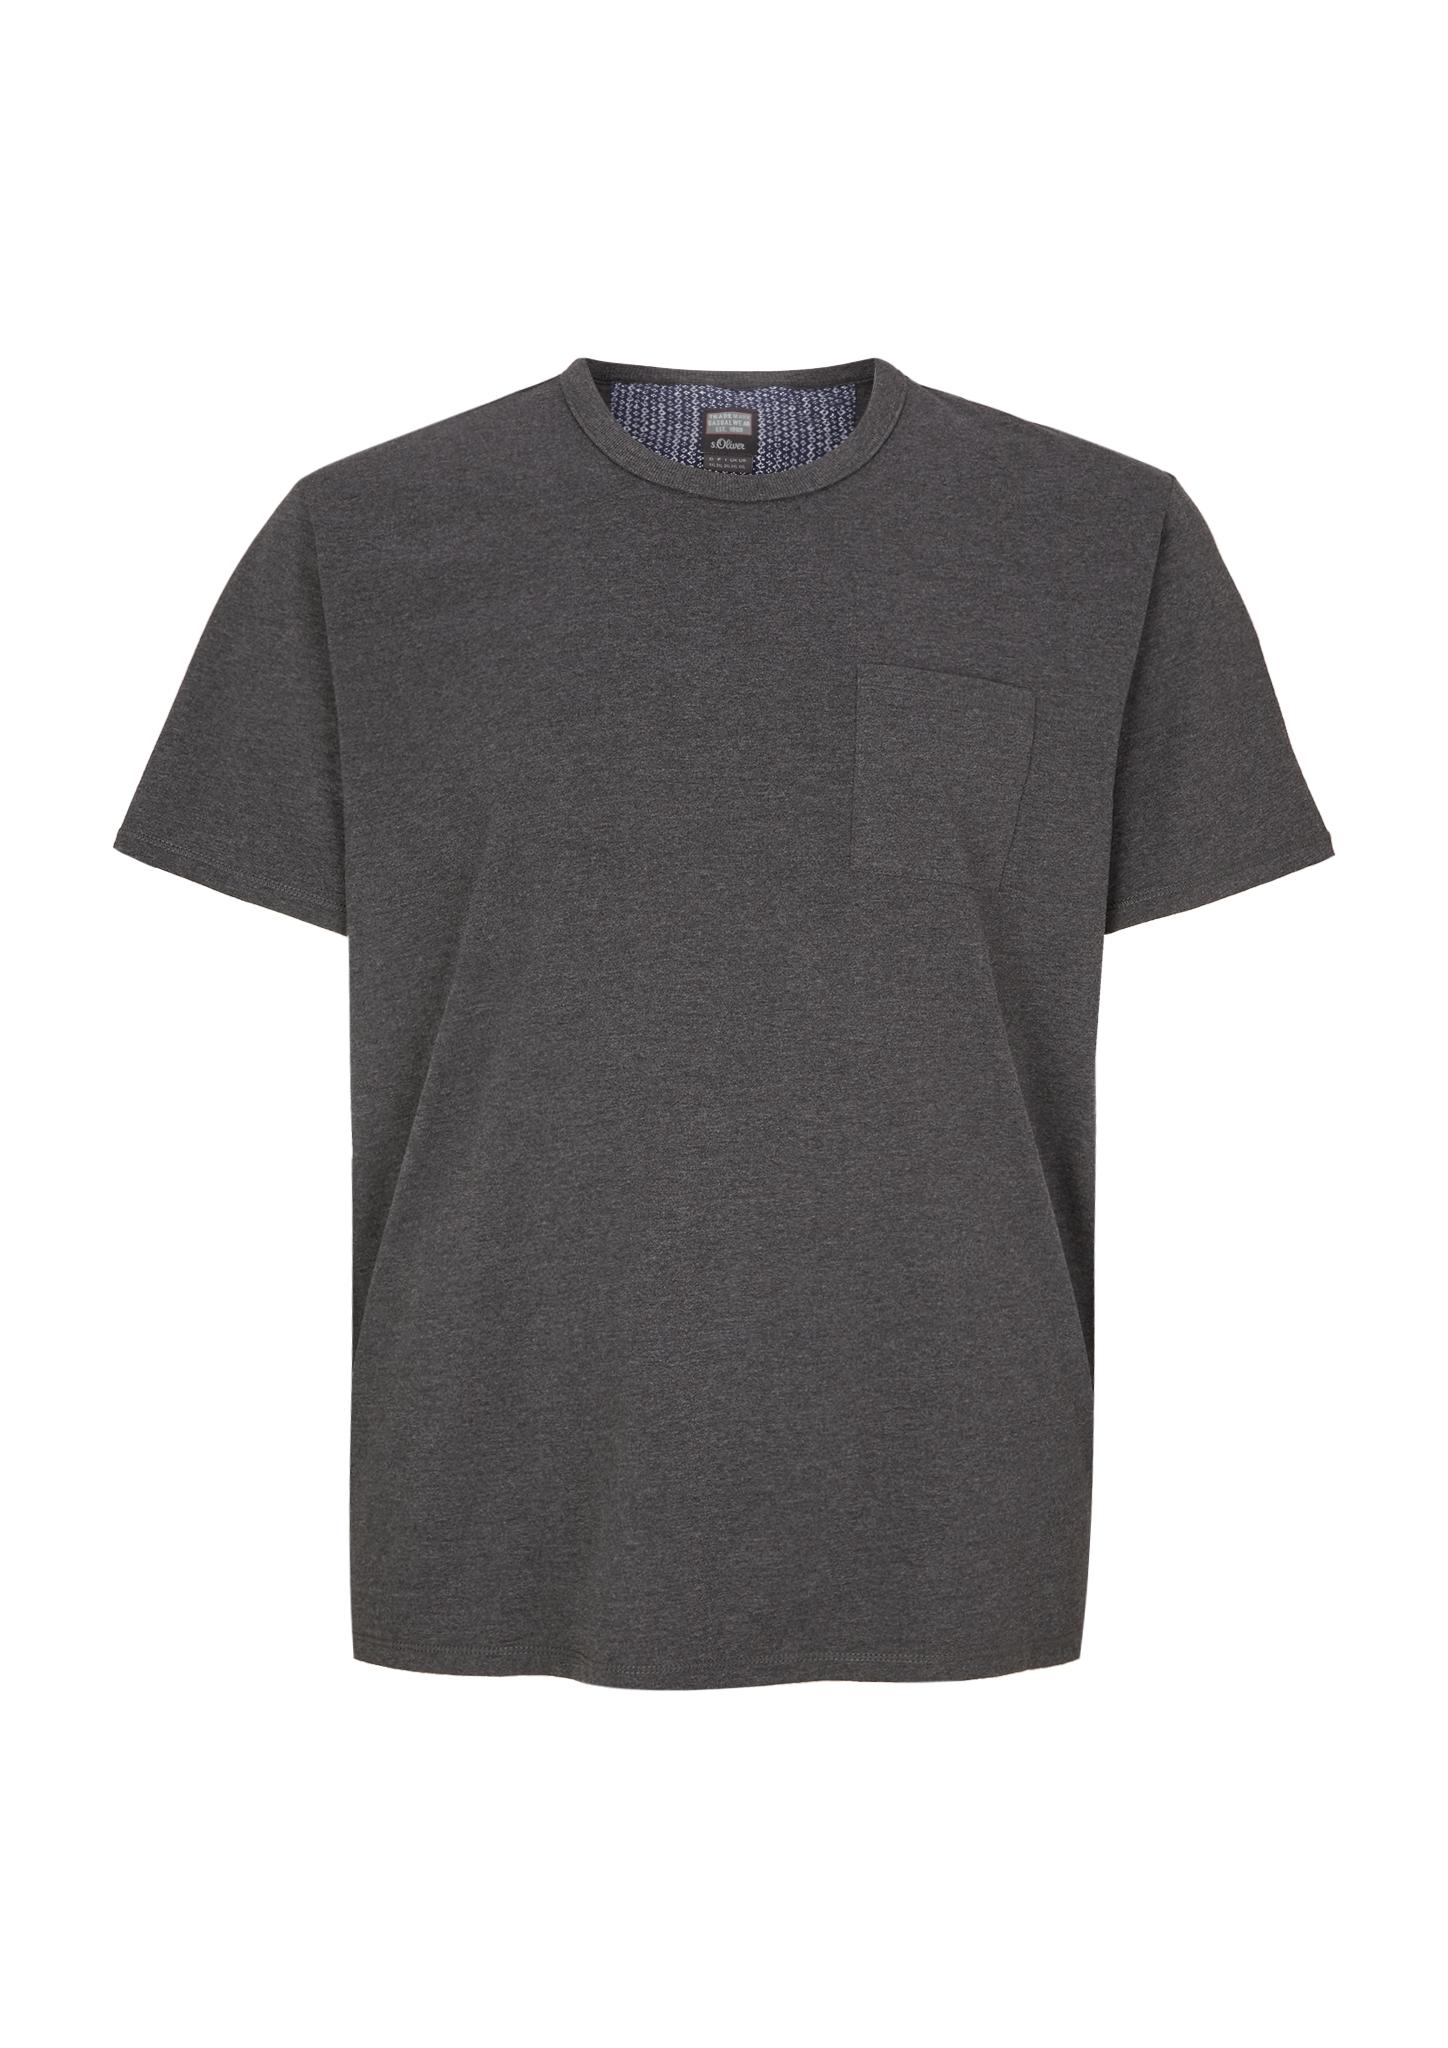 T-Shirt | Bekleidung > Shirts > Sonstige Shirts | Grau | 60% baumwolle -  40% polyester | s.Oliver Men Big Sizes